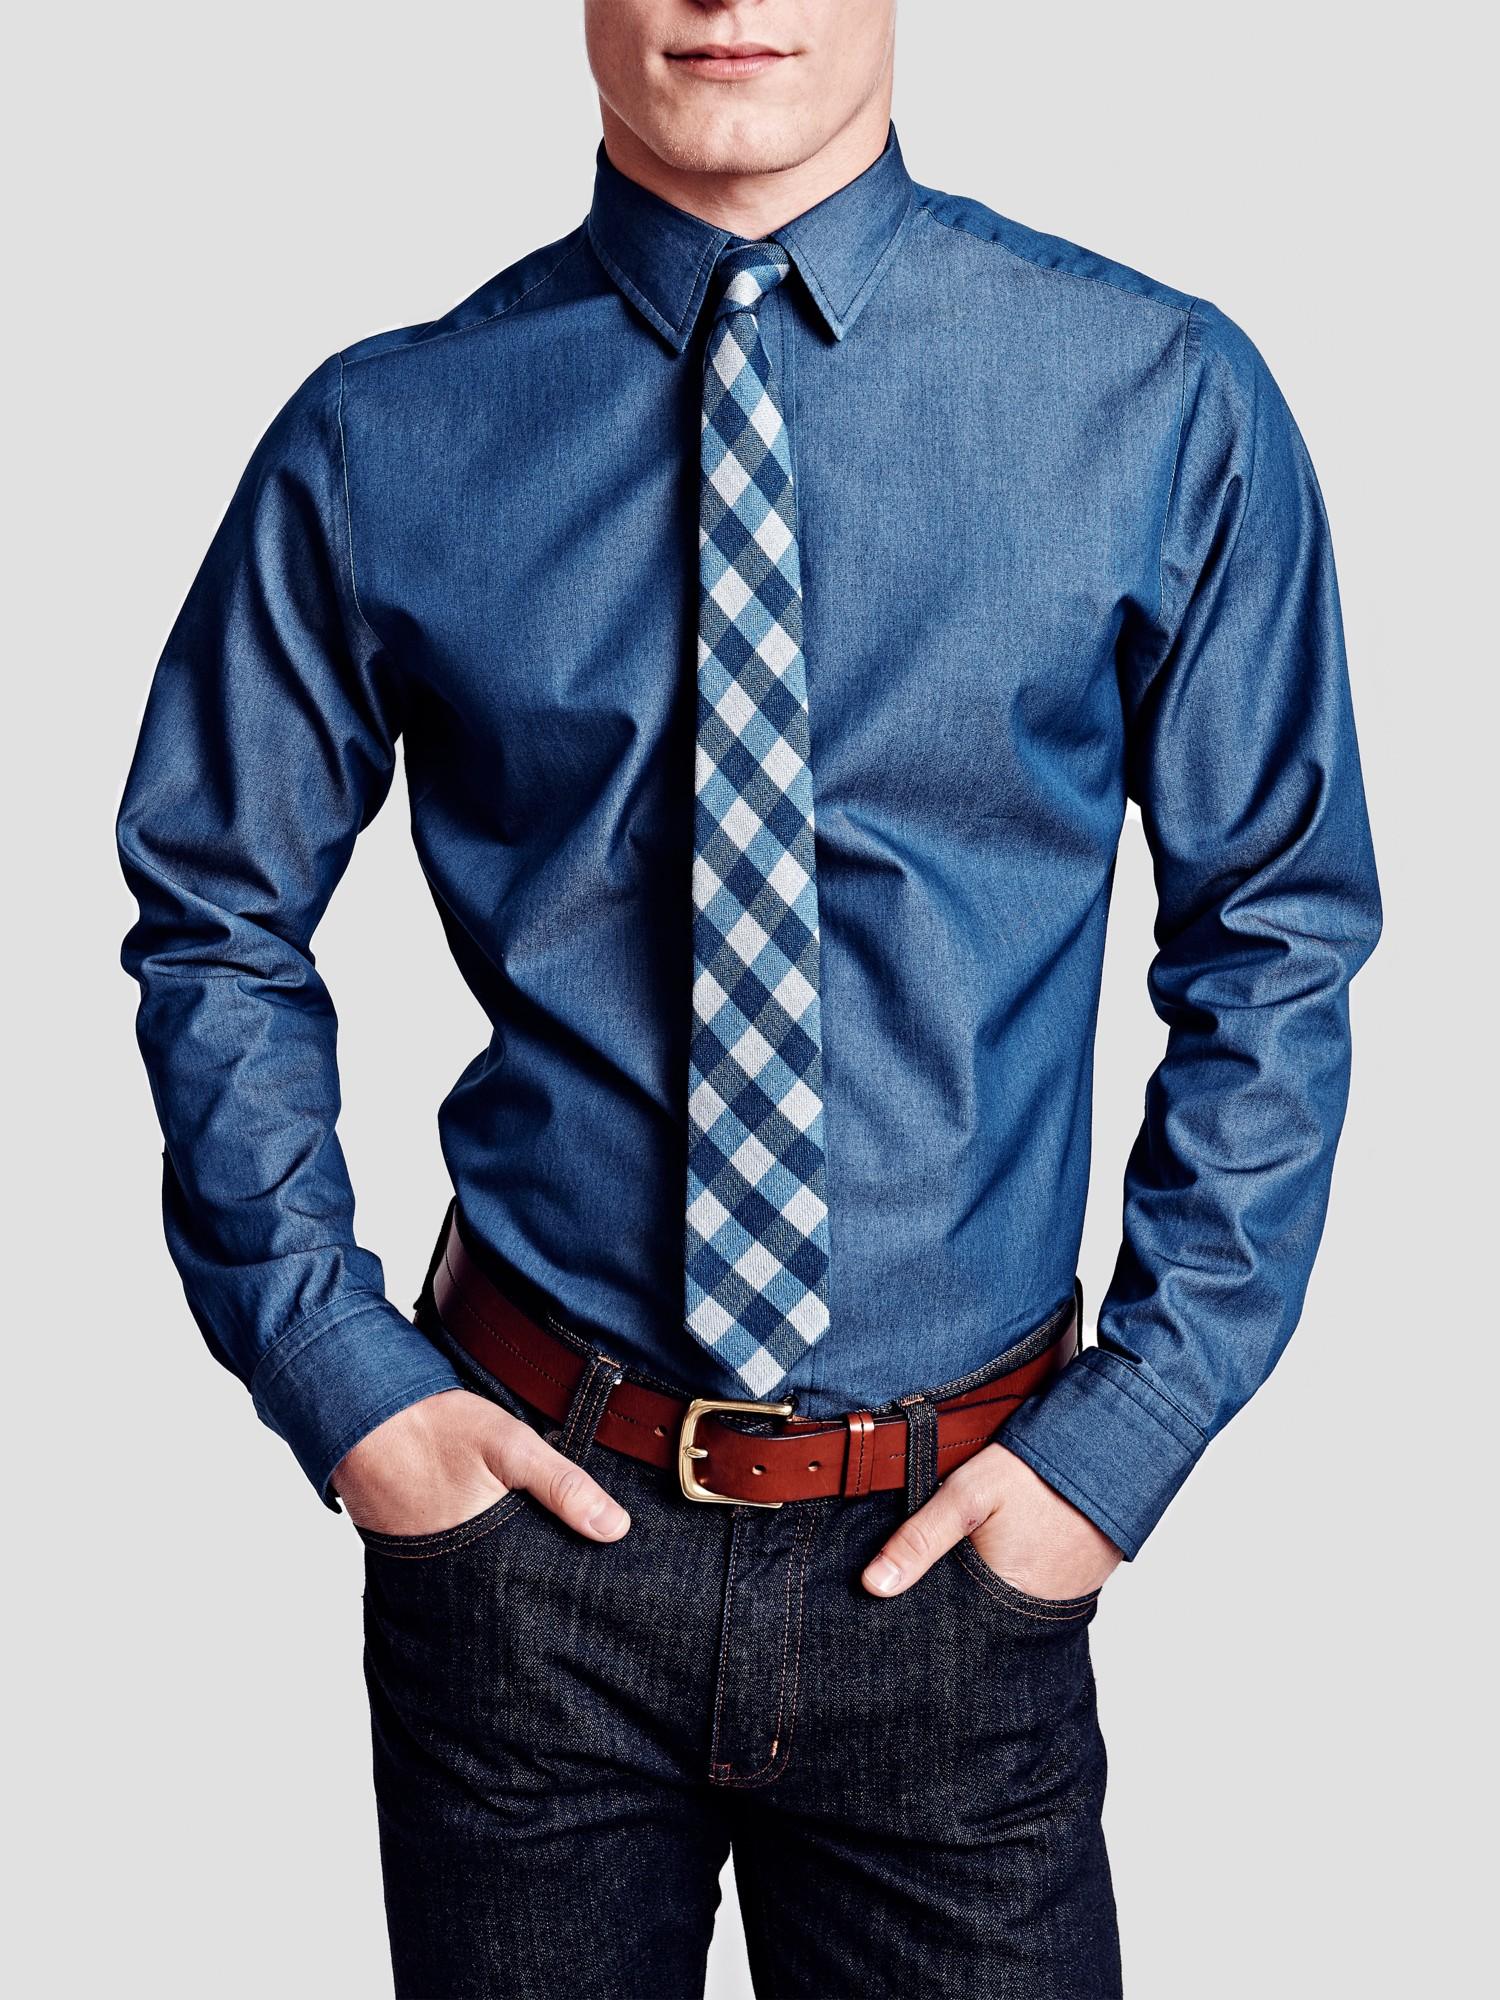 Thomas Pink Caldicot Plain Super Slim Fit Shirt In Blue